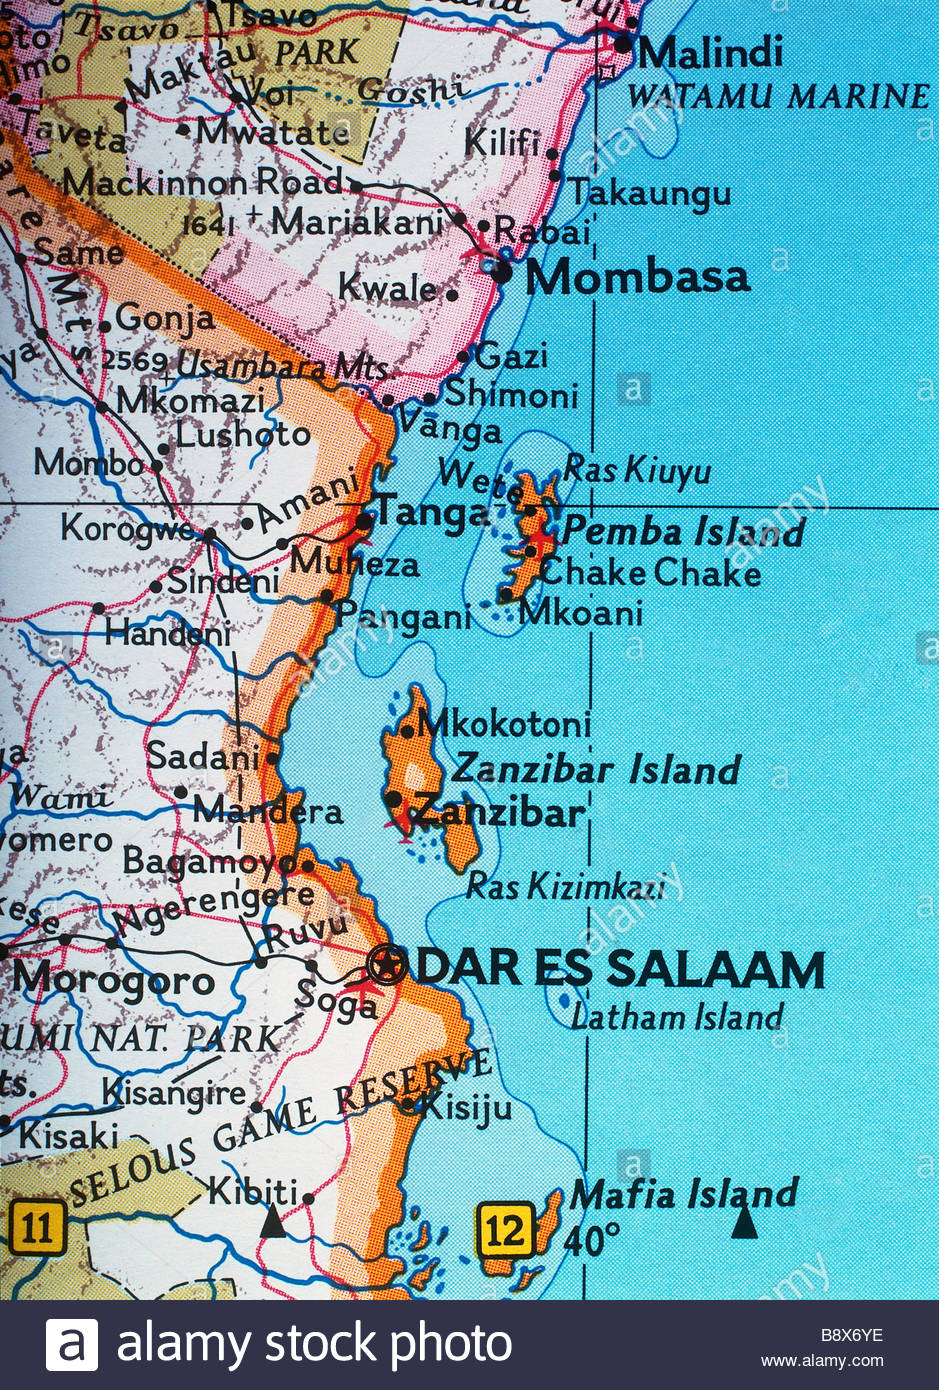 Map Of Africa Zanzibar.Zanzibar Tanzania Africa Stock Photo 22703842 Alamy